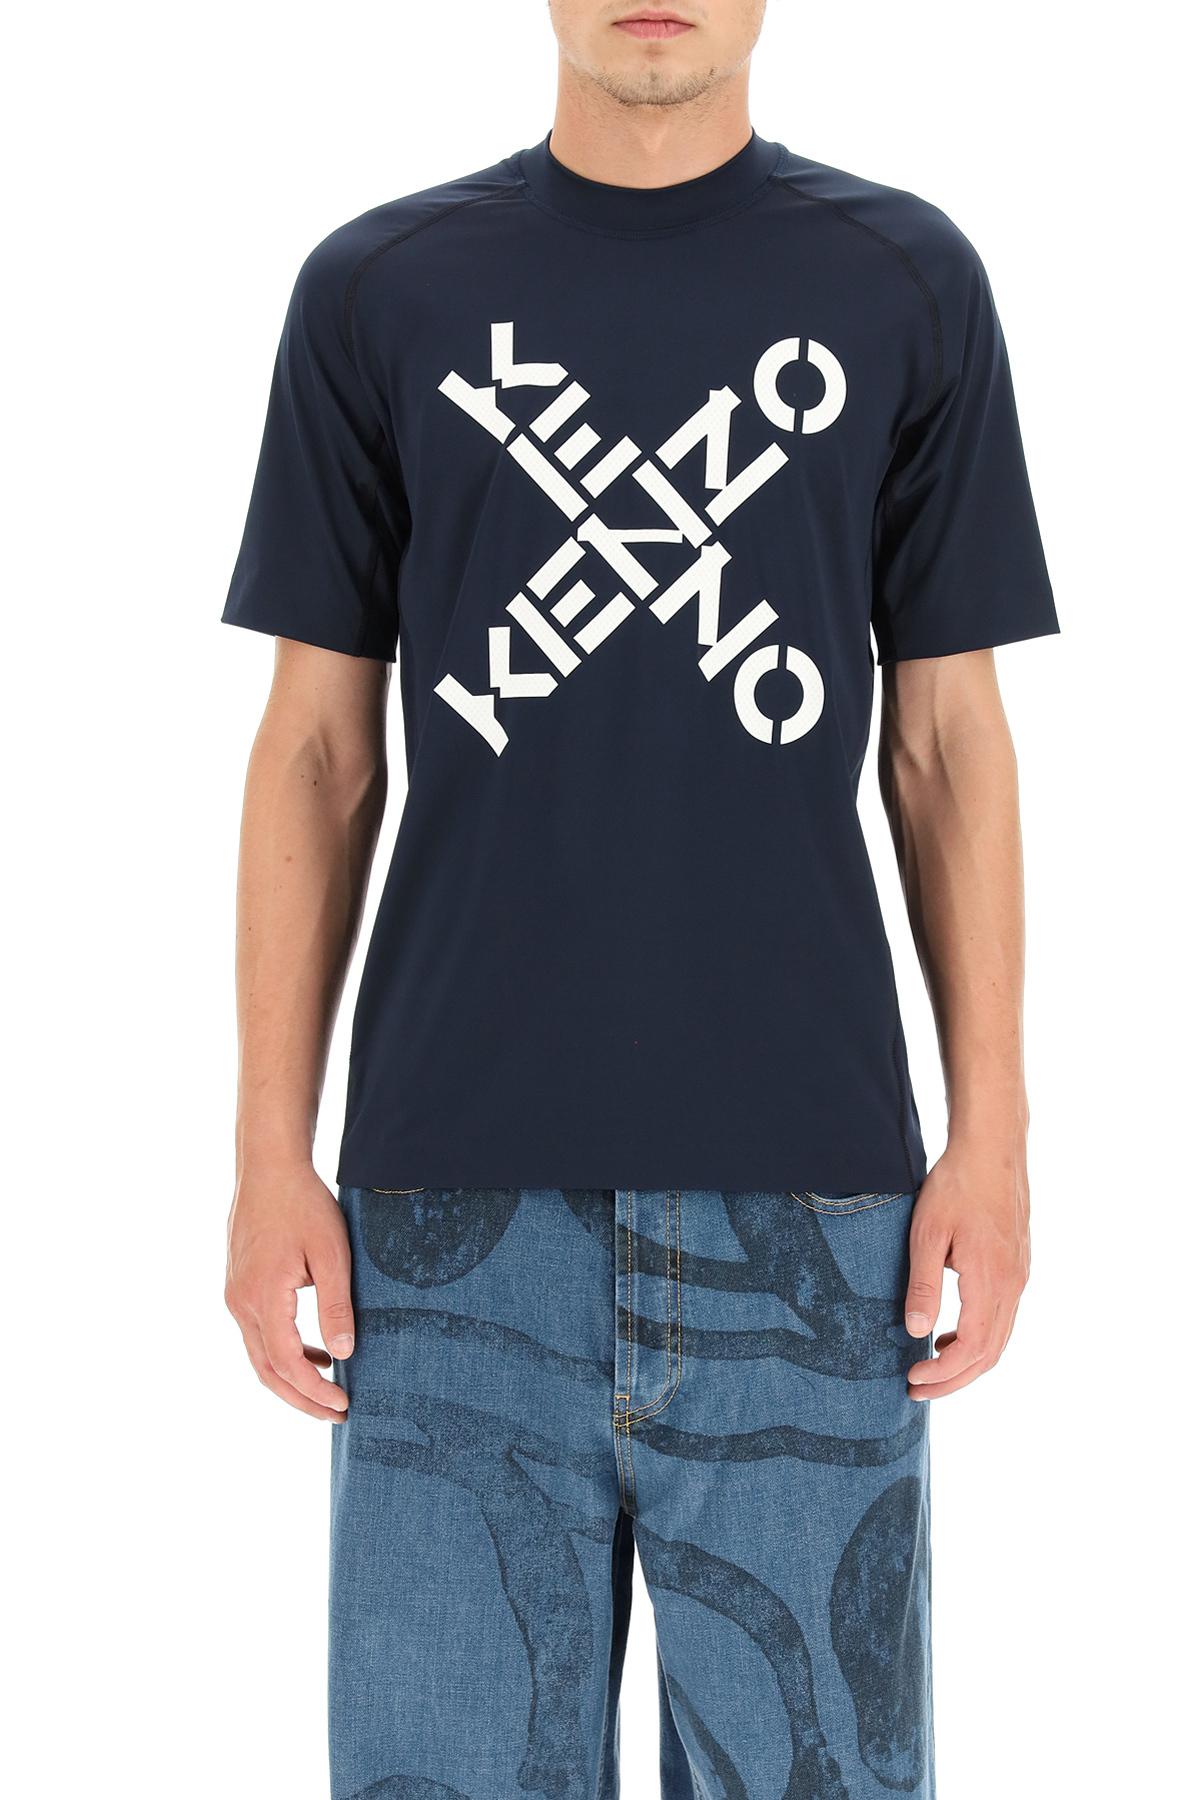 Kenzo t-shirt sportiva stampa big x